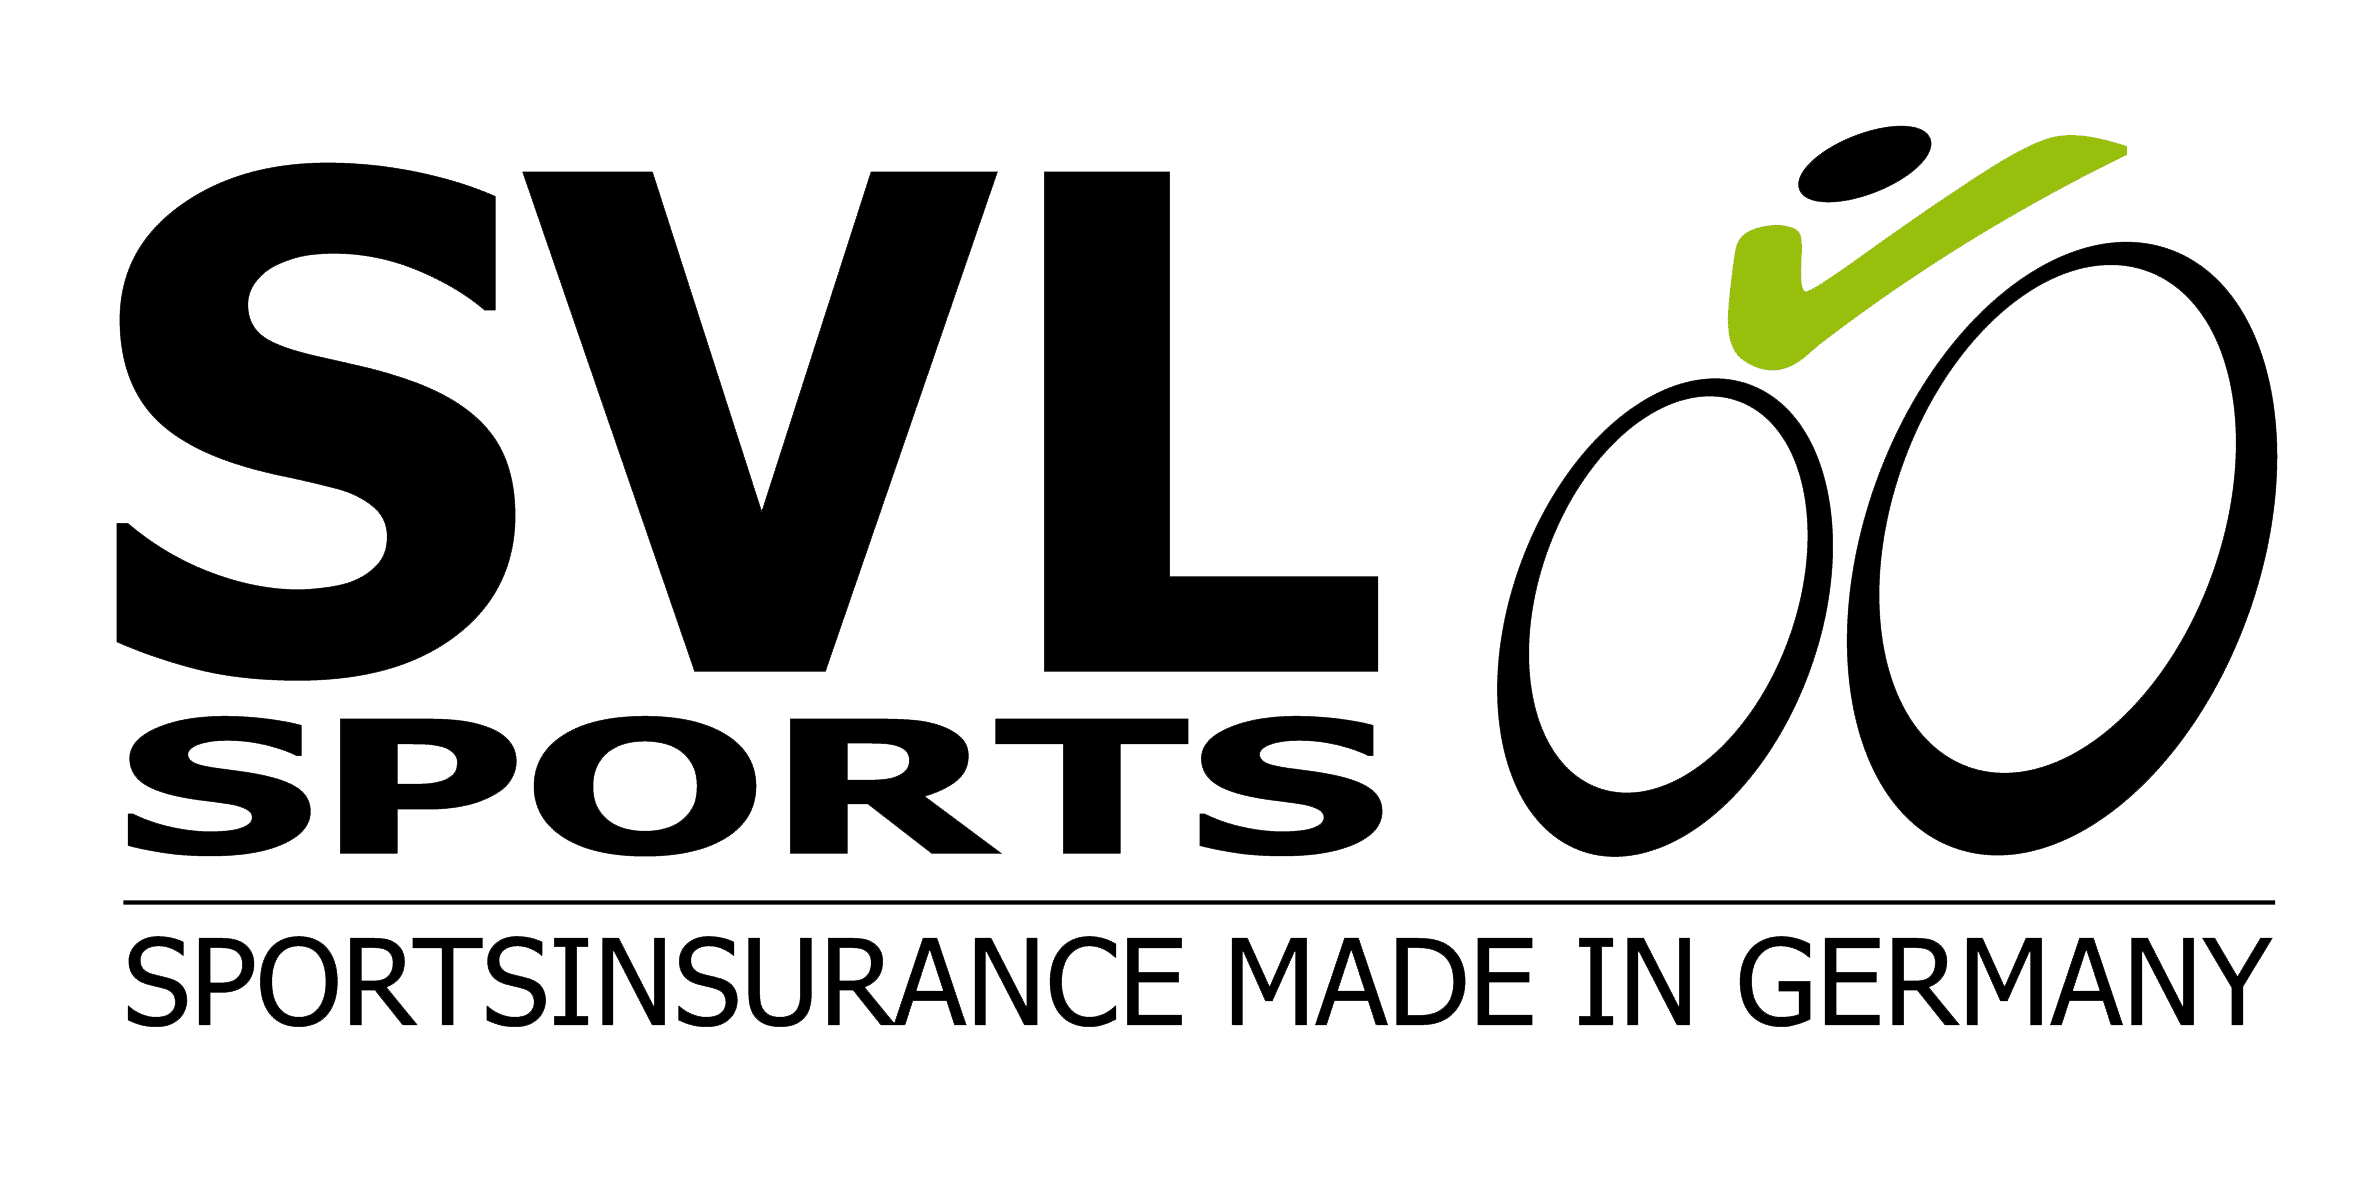 SVL Sports GmbH